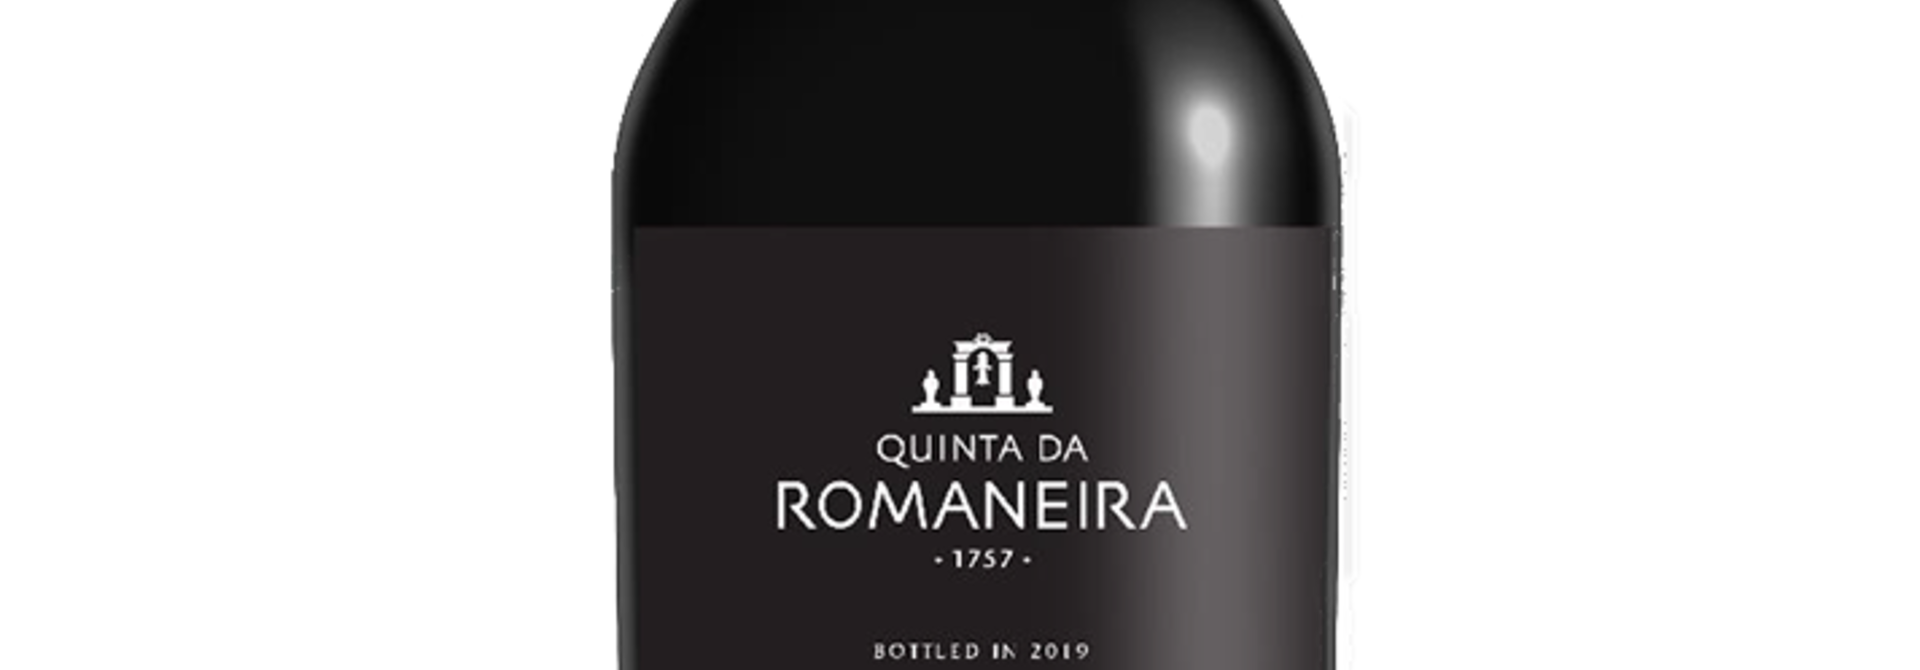 Quinta da Romaneira Vintage Port 2017